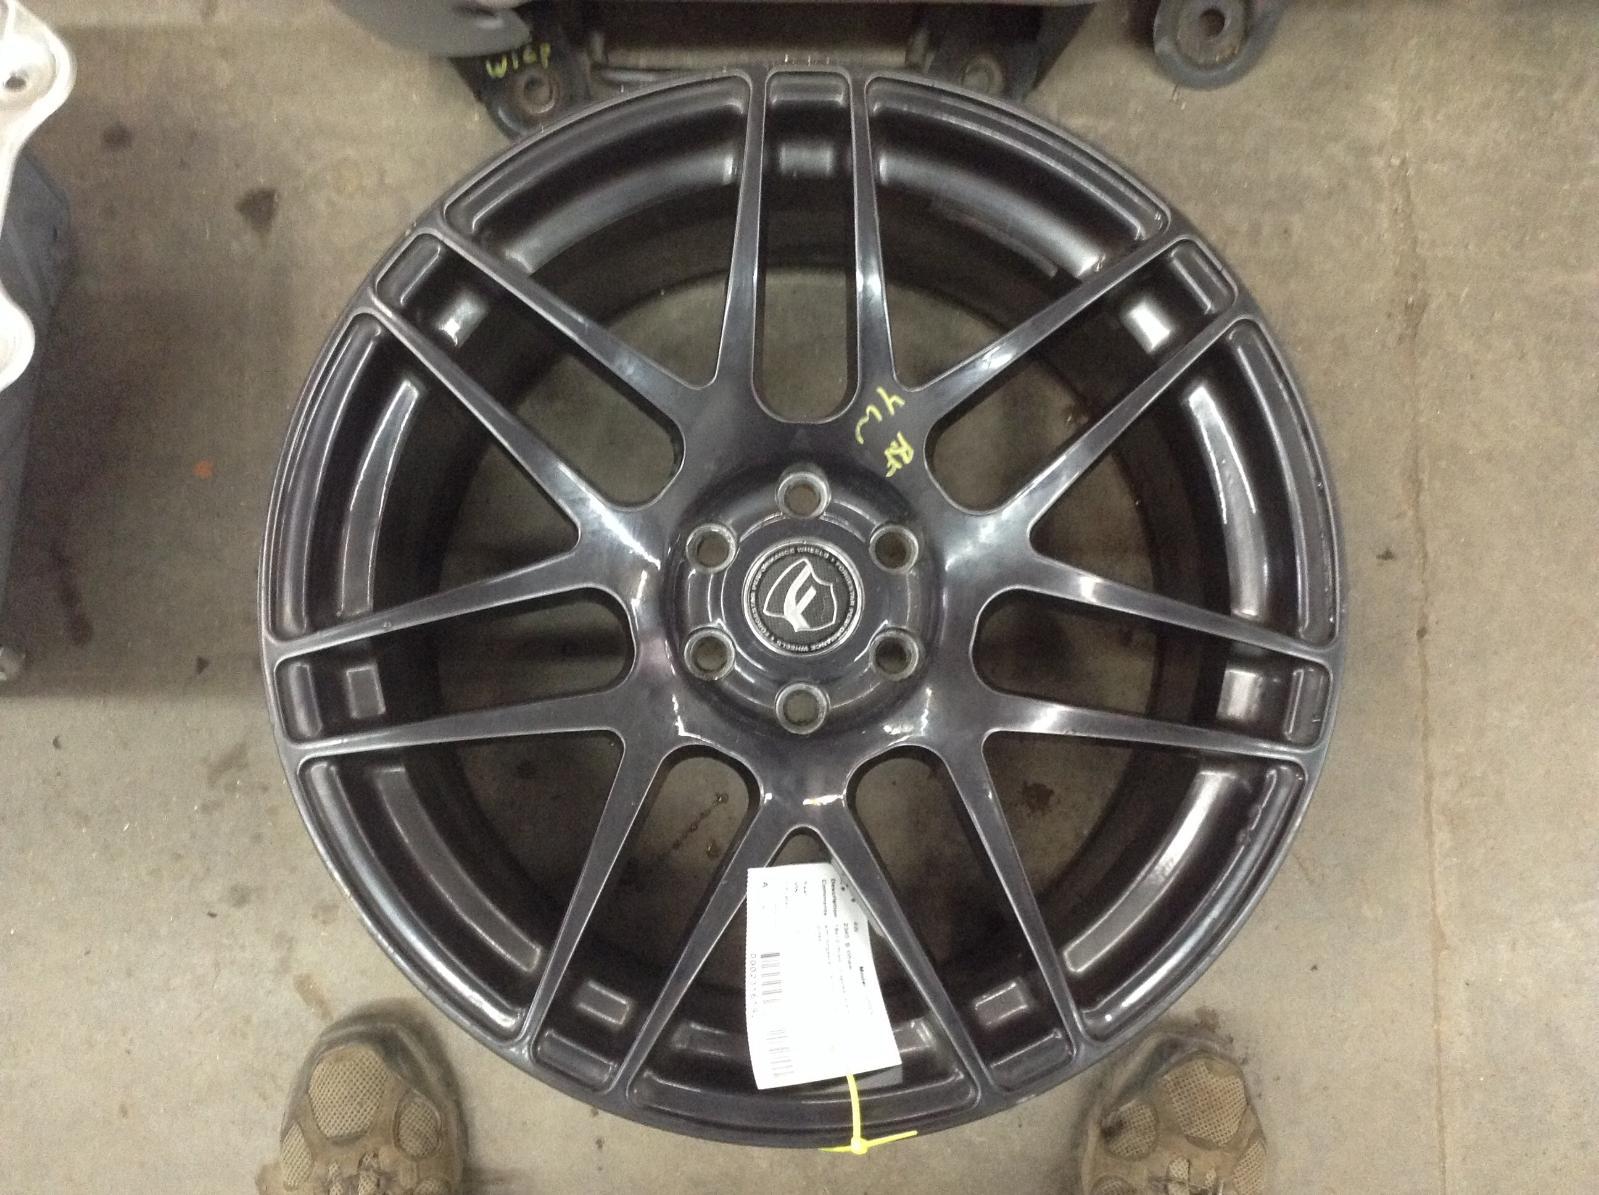 Used Wheel for sale for a 2010 Dodge Viper   PartsMarket